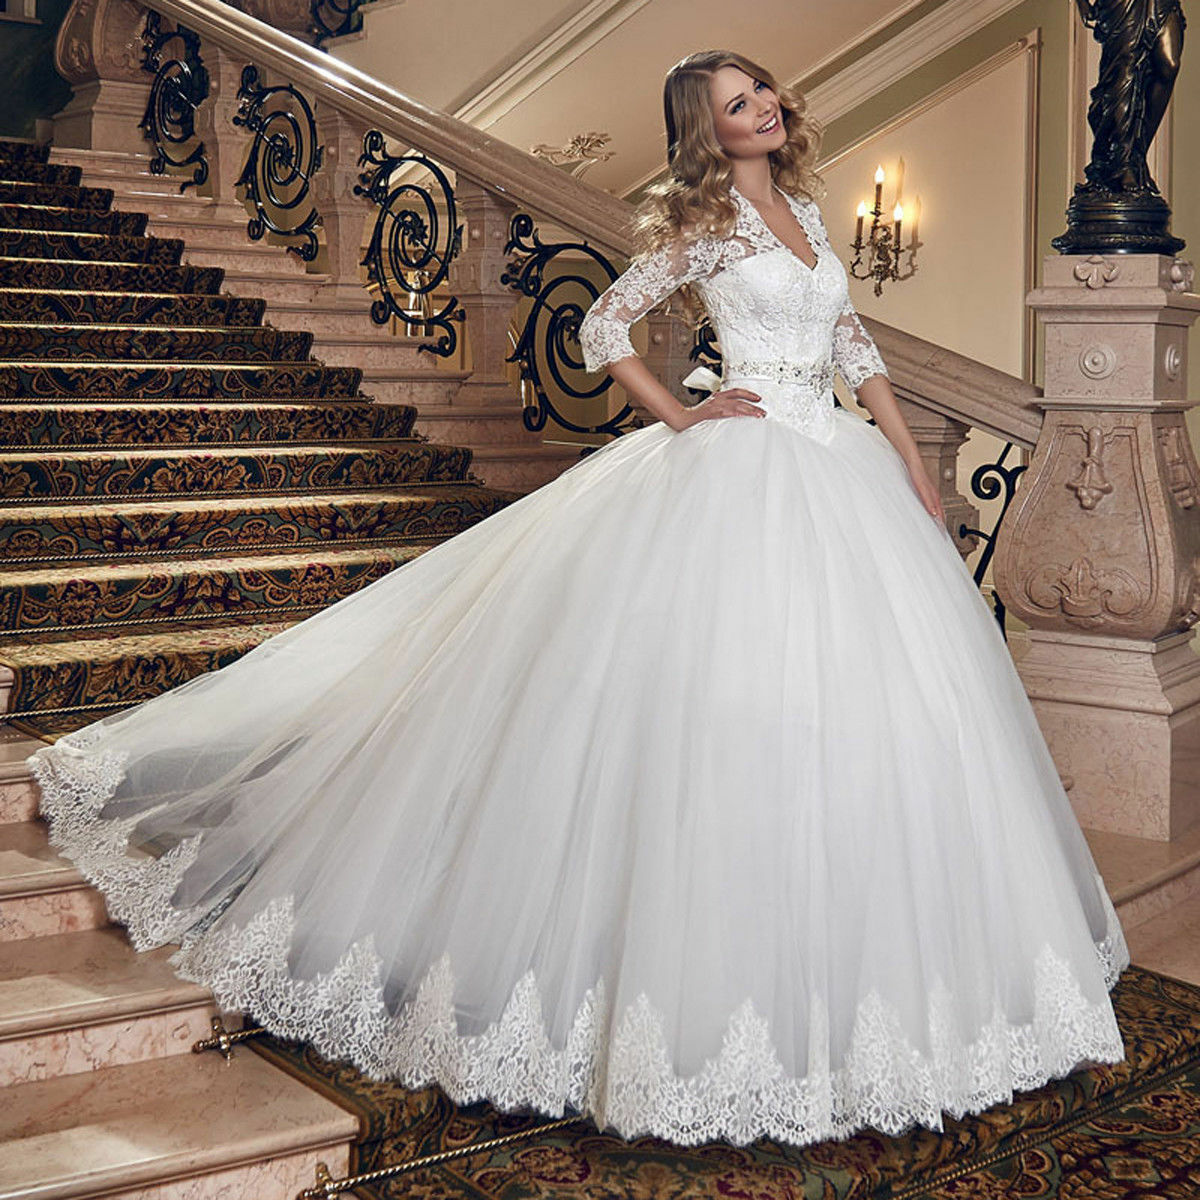 New White Ivory Vintage Lace Illusion 3/4 Sleeves Crystal Bridal Wedding Dresses